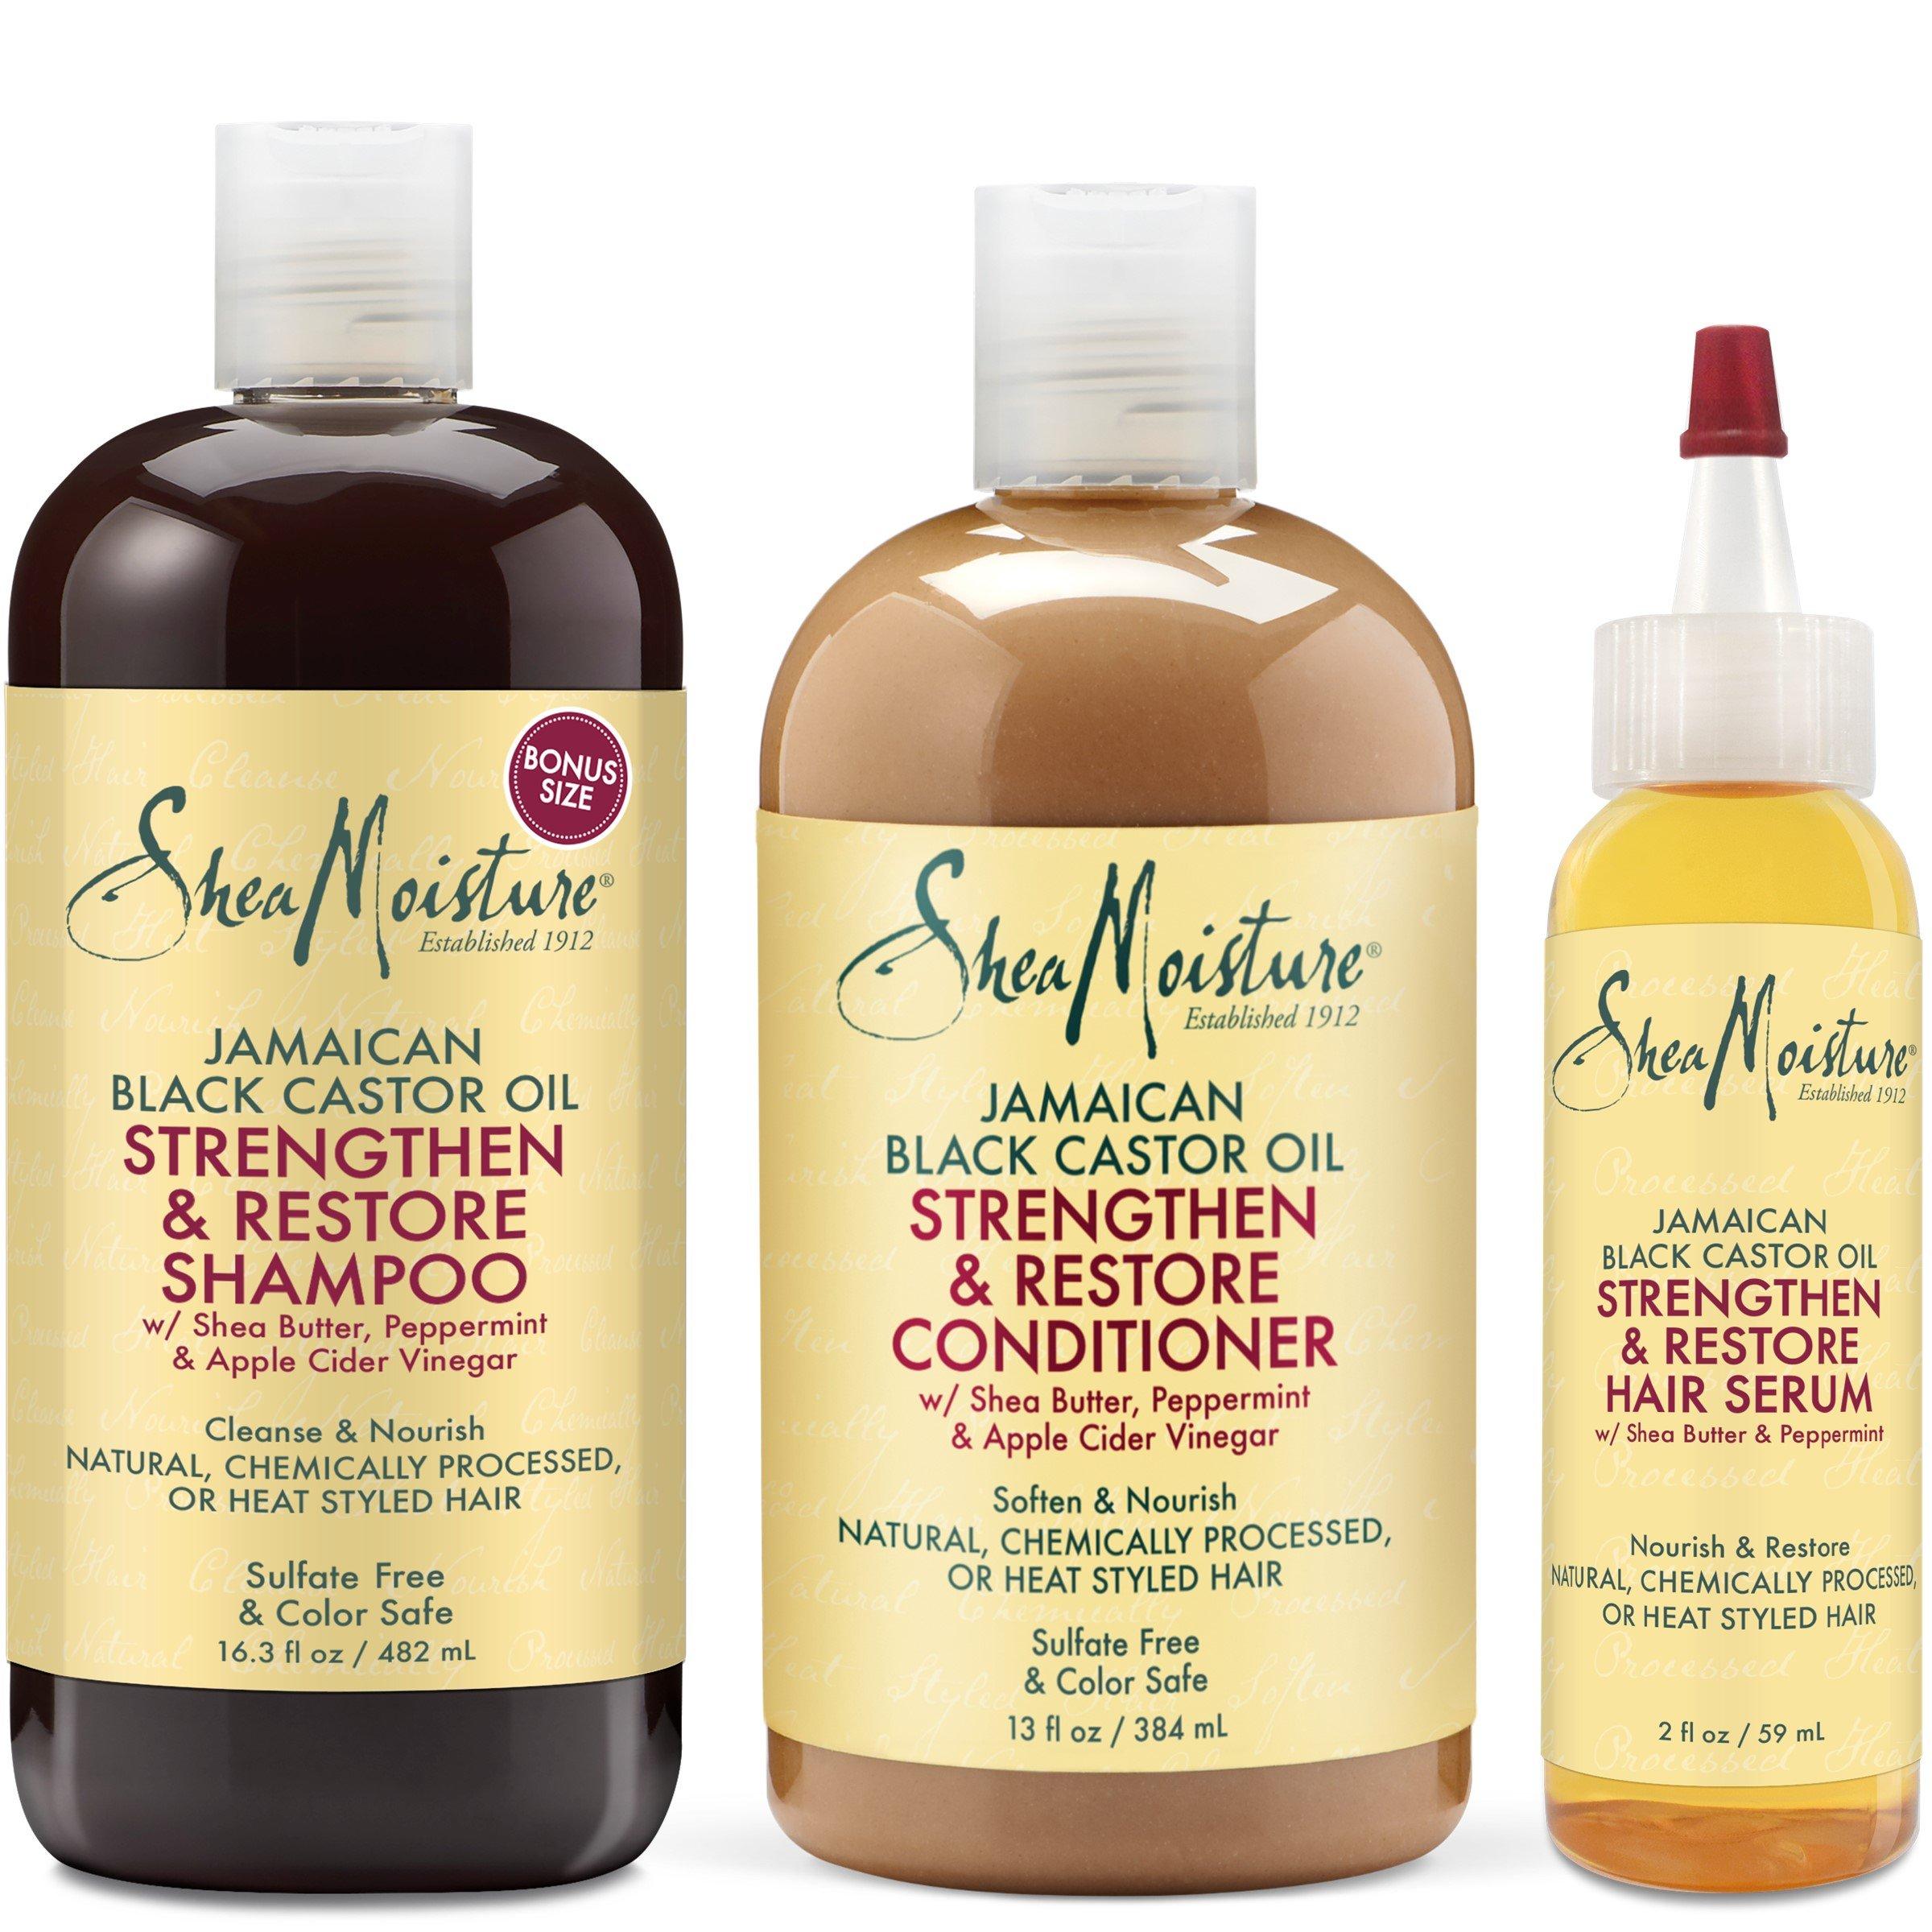 Shea Moisture Jamaican Black Castor Oil Strengthen Grow & Restore Combination Pack, Shampoo 16.3 Ounce | Conditioner 13 Ounce | Hair Serum 2 Ounce by Shea Moisture